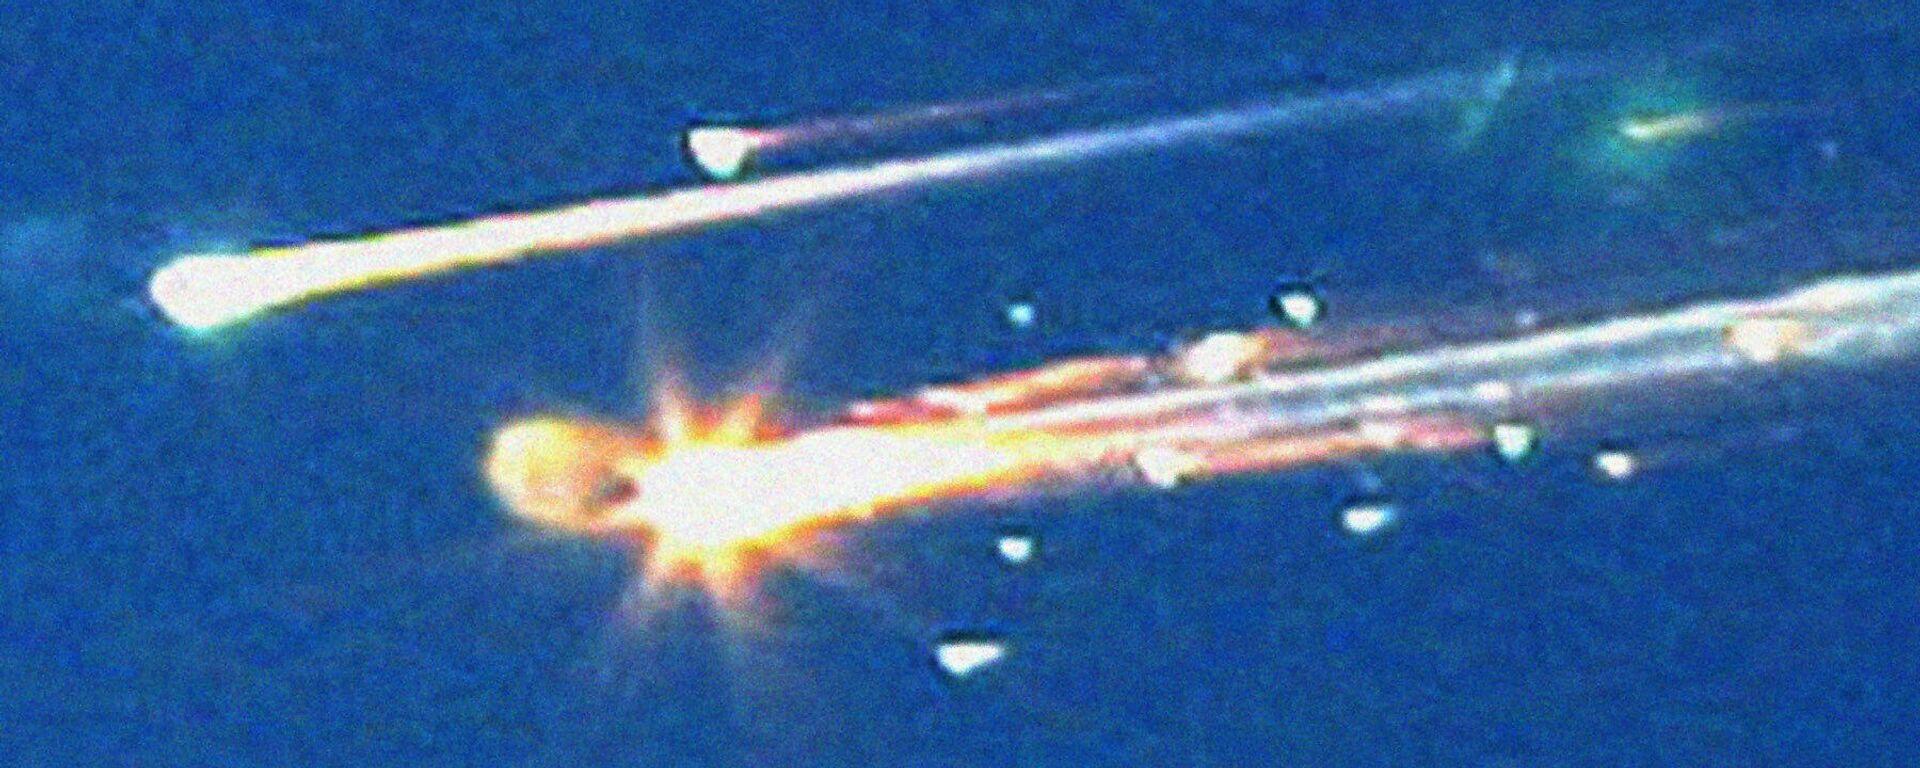 Basura espacial cayendo a la Tierra, foto de archivo - Sputnik Mundo, 1920, 24.05.2021